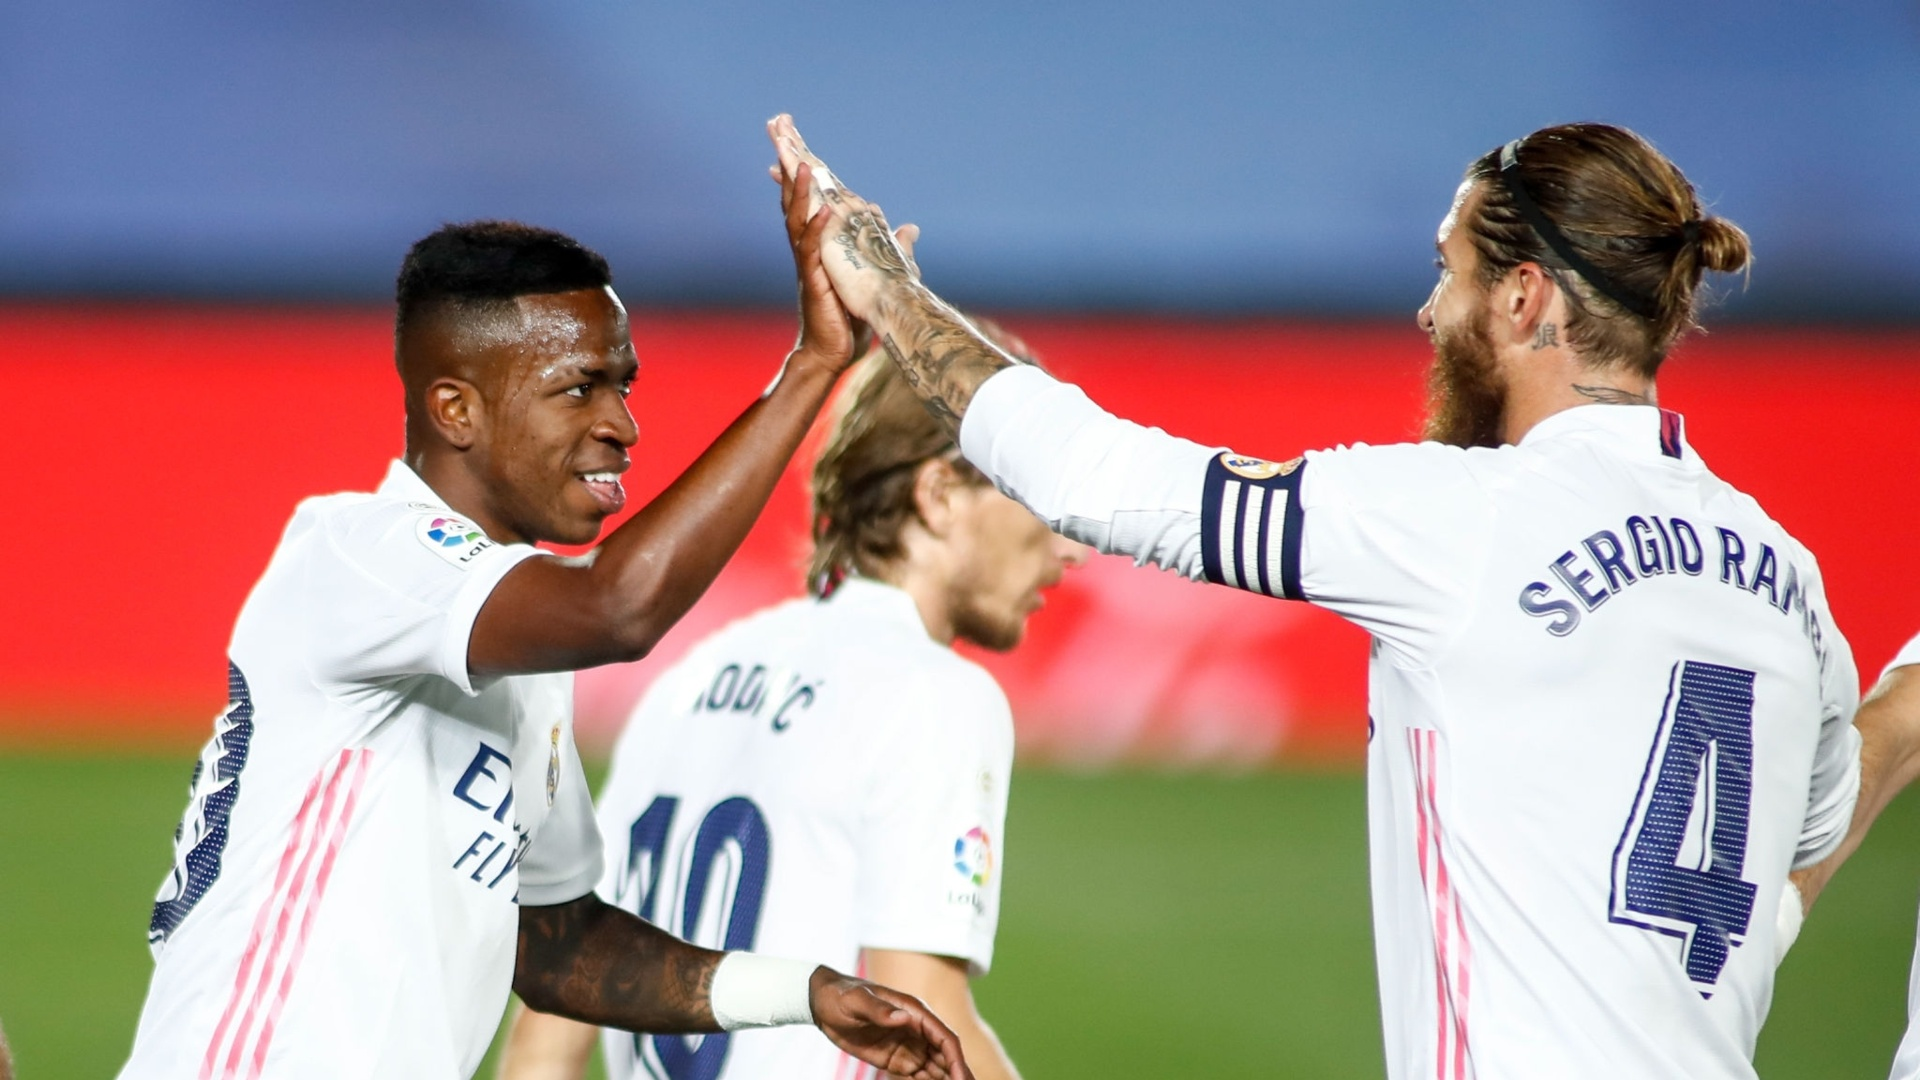 Match report: Real Madrid 1-0 Valladolid